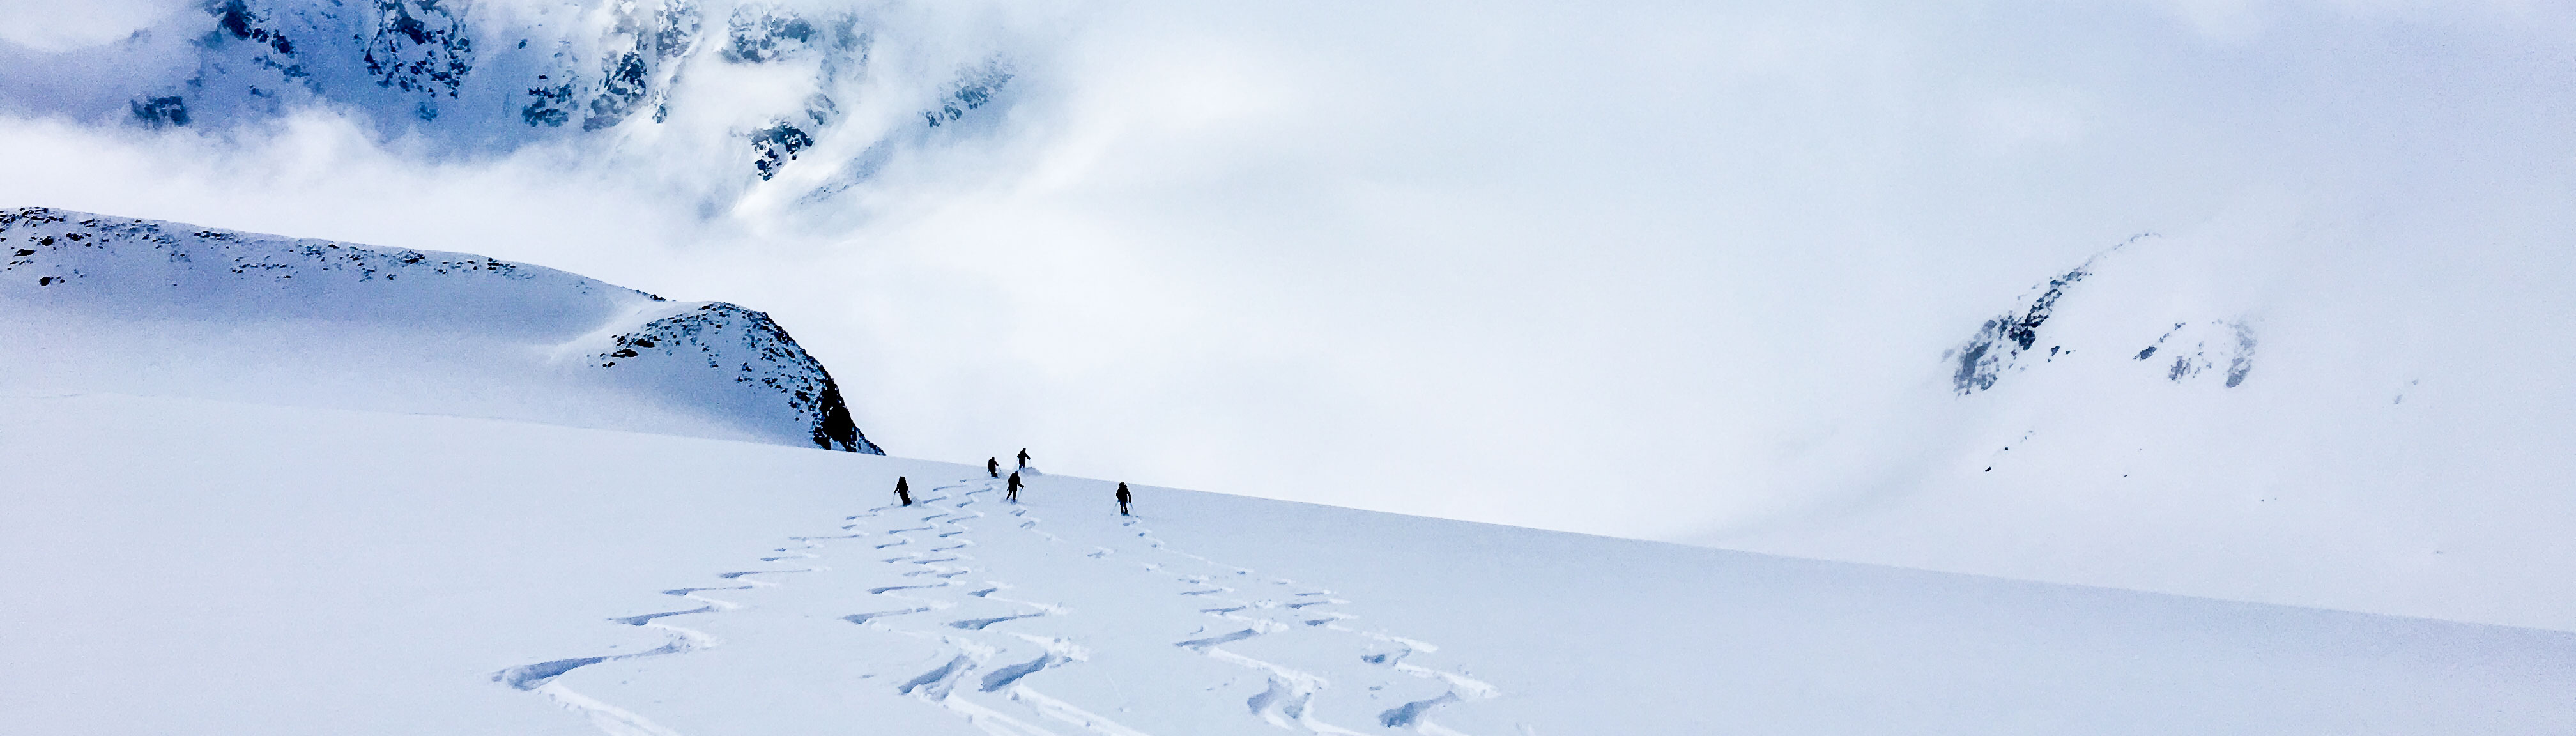 bergführer skitouren-woche